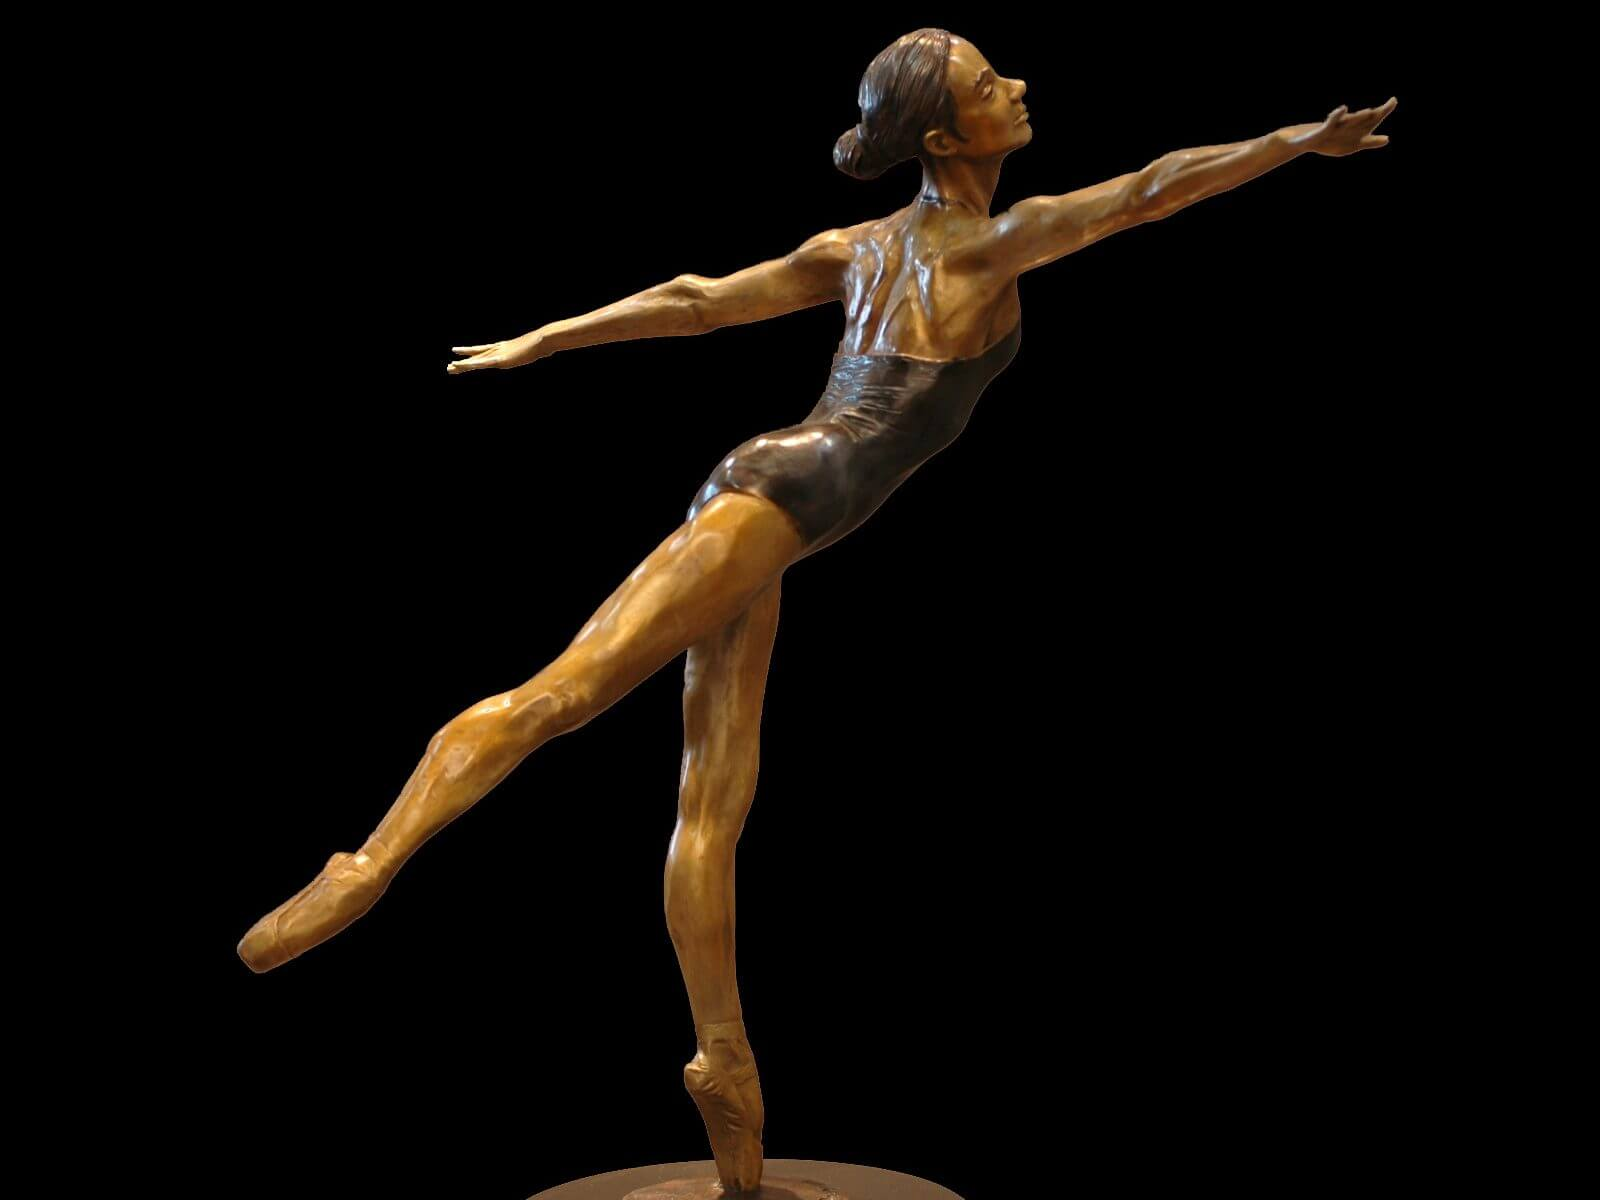 Moment of Grace a bronze female ballet dance sculpture by Andrew DeVries